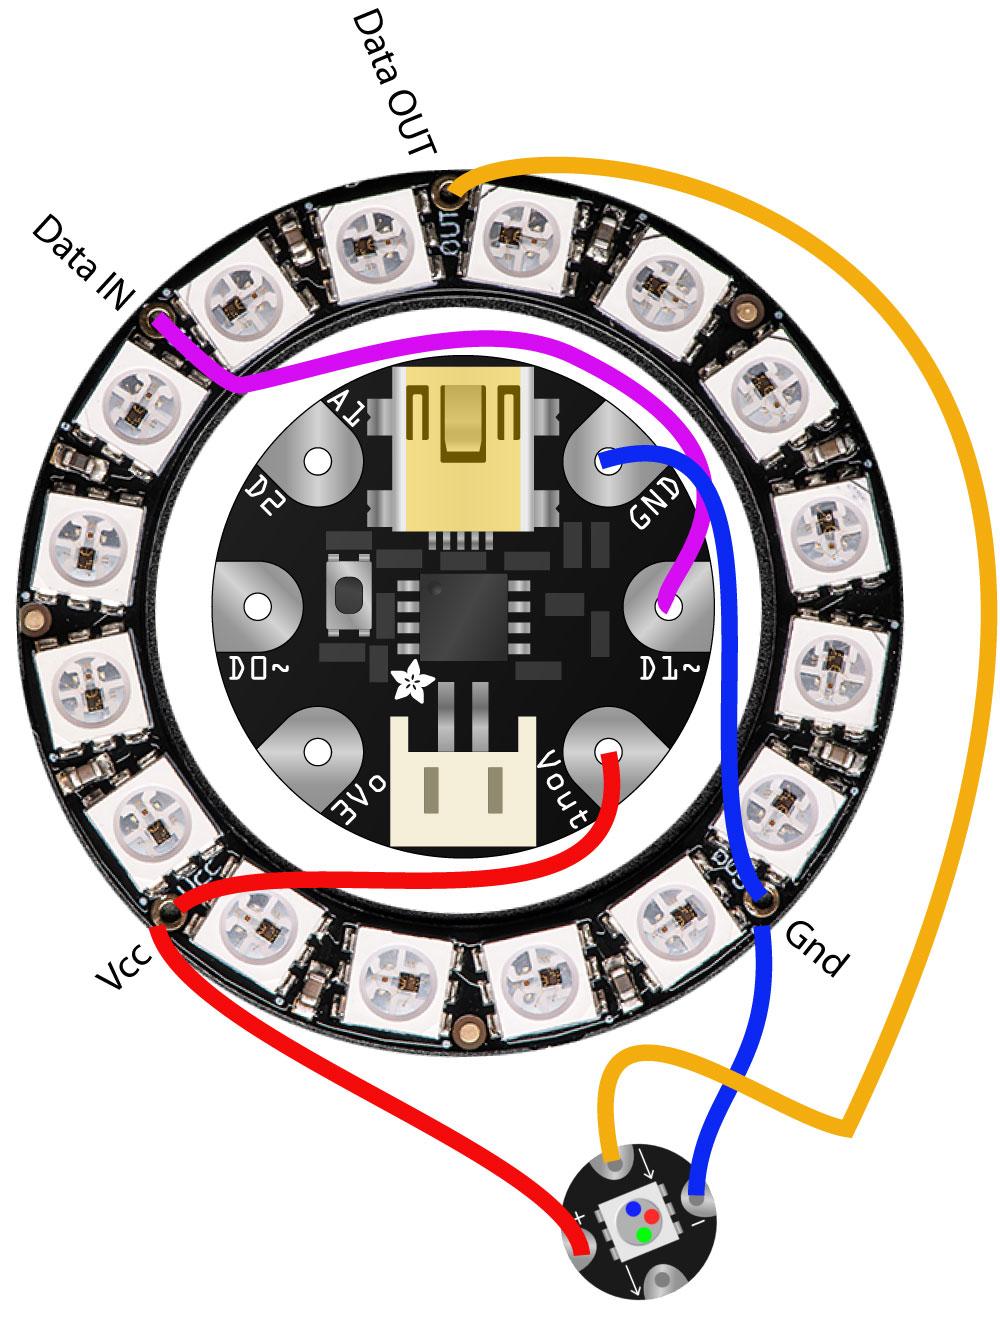 flora_adafruit-arc-reactor-diagram.jpg